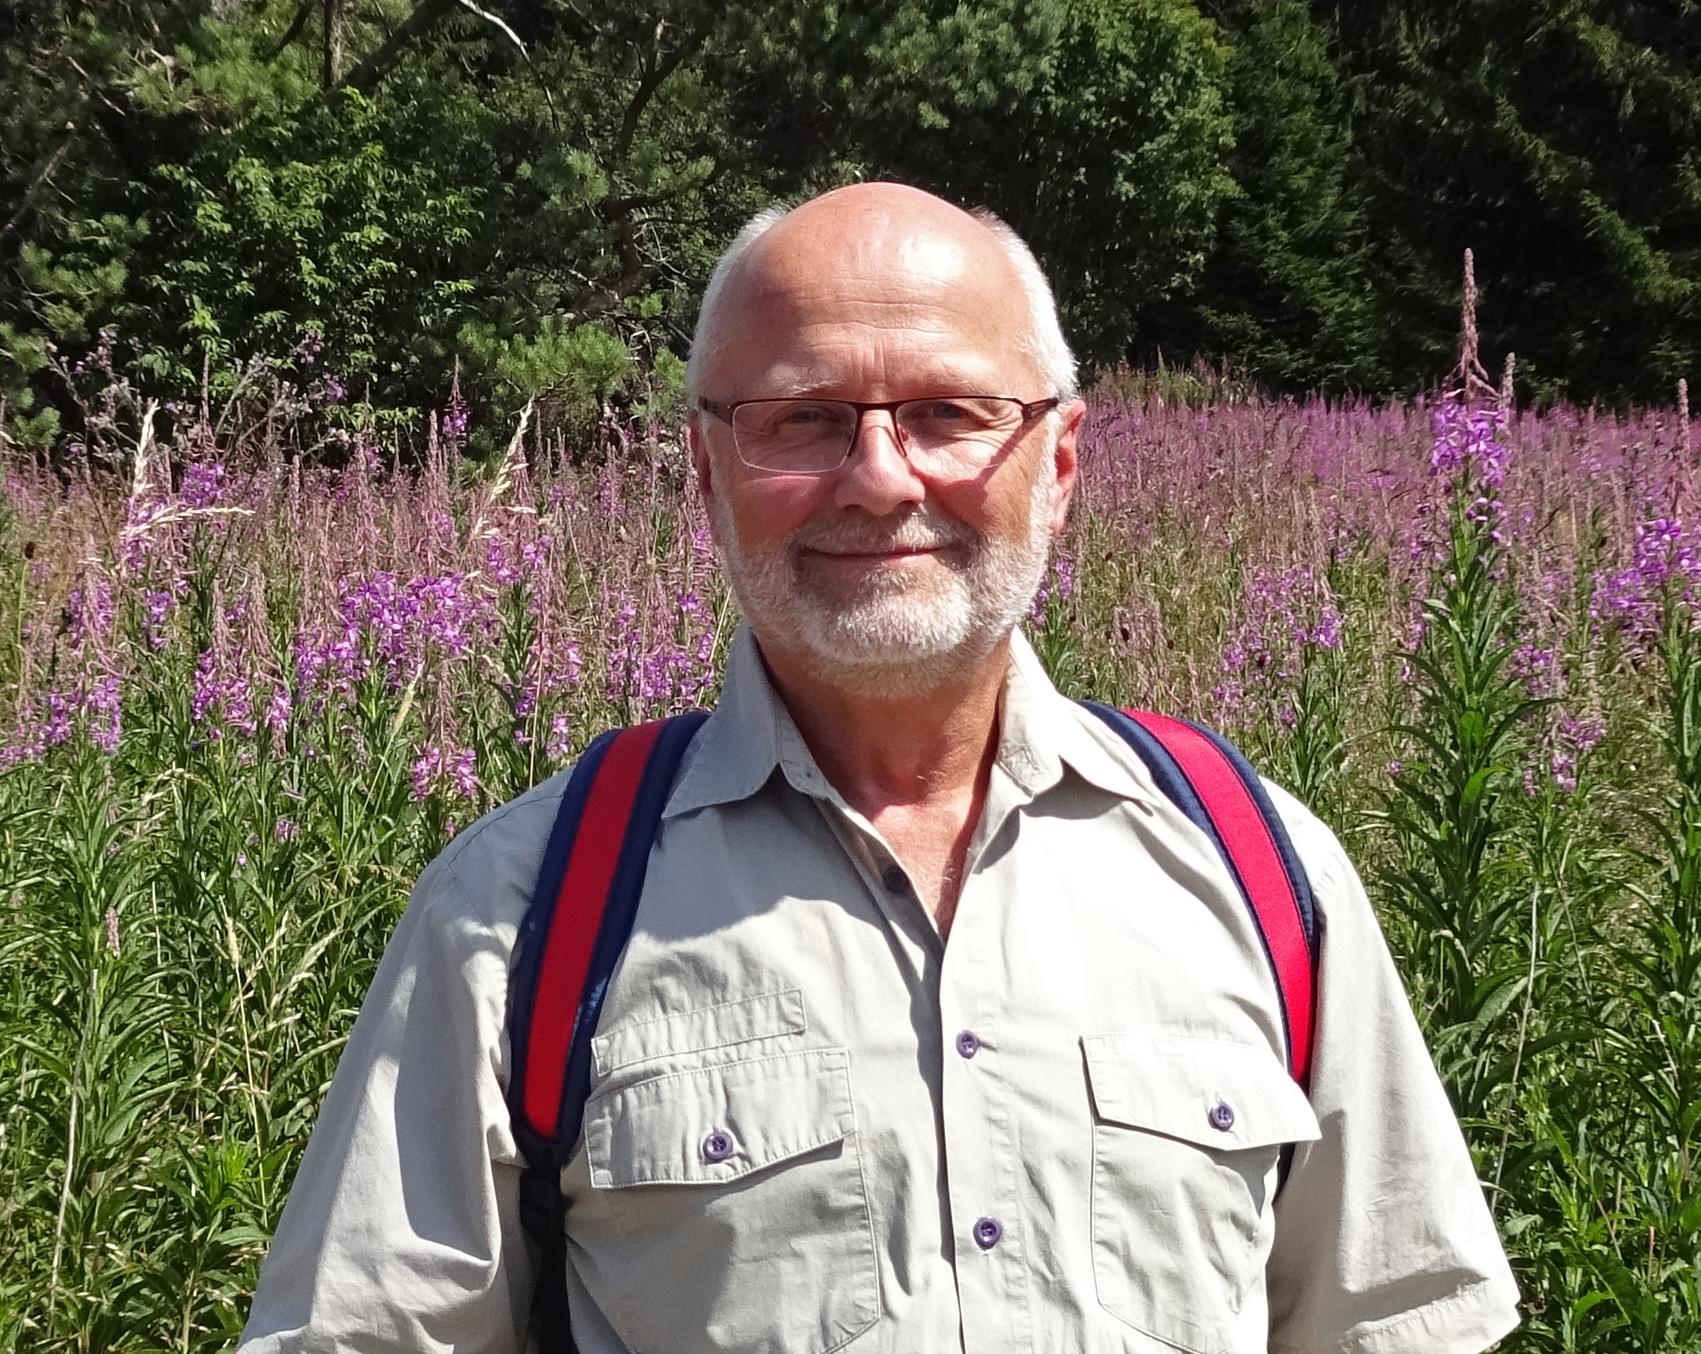 Richard Kalkbrenner, Kreisgruppenvorsitzender in Aschaffenburg